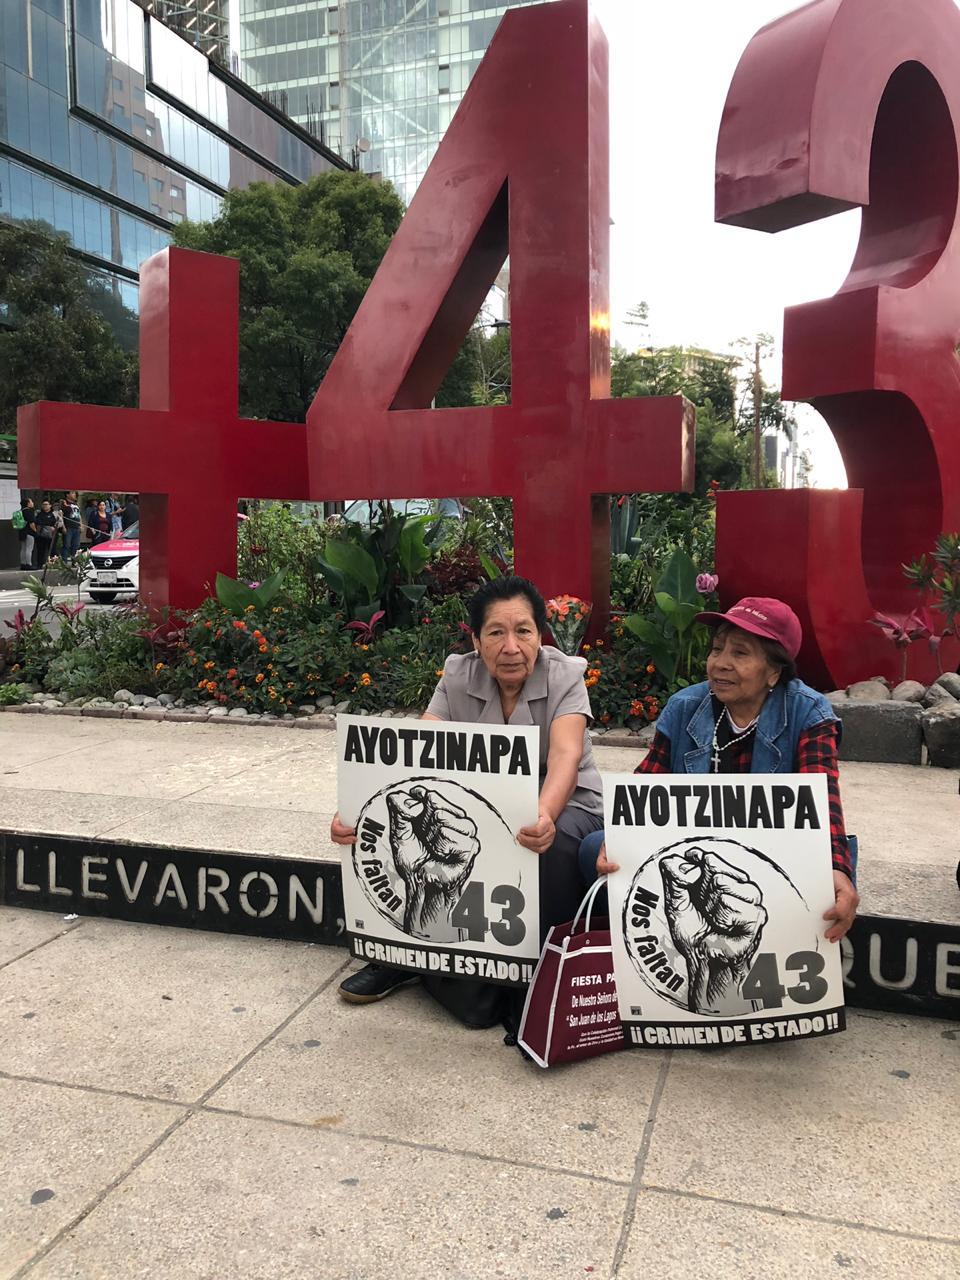 marcha-ayotzinapa-06